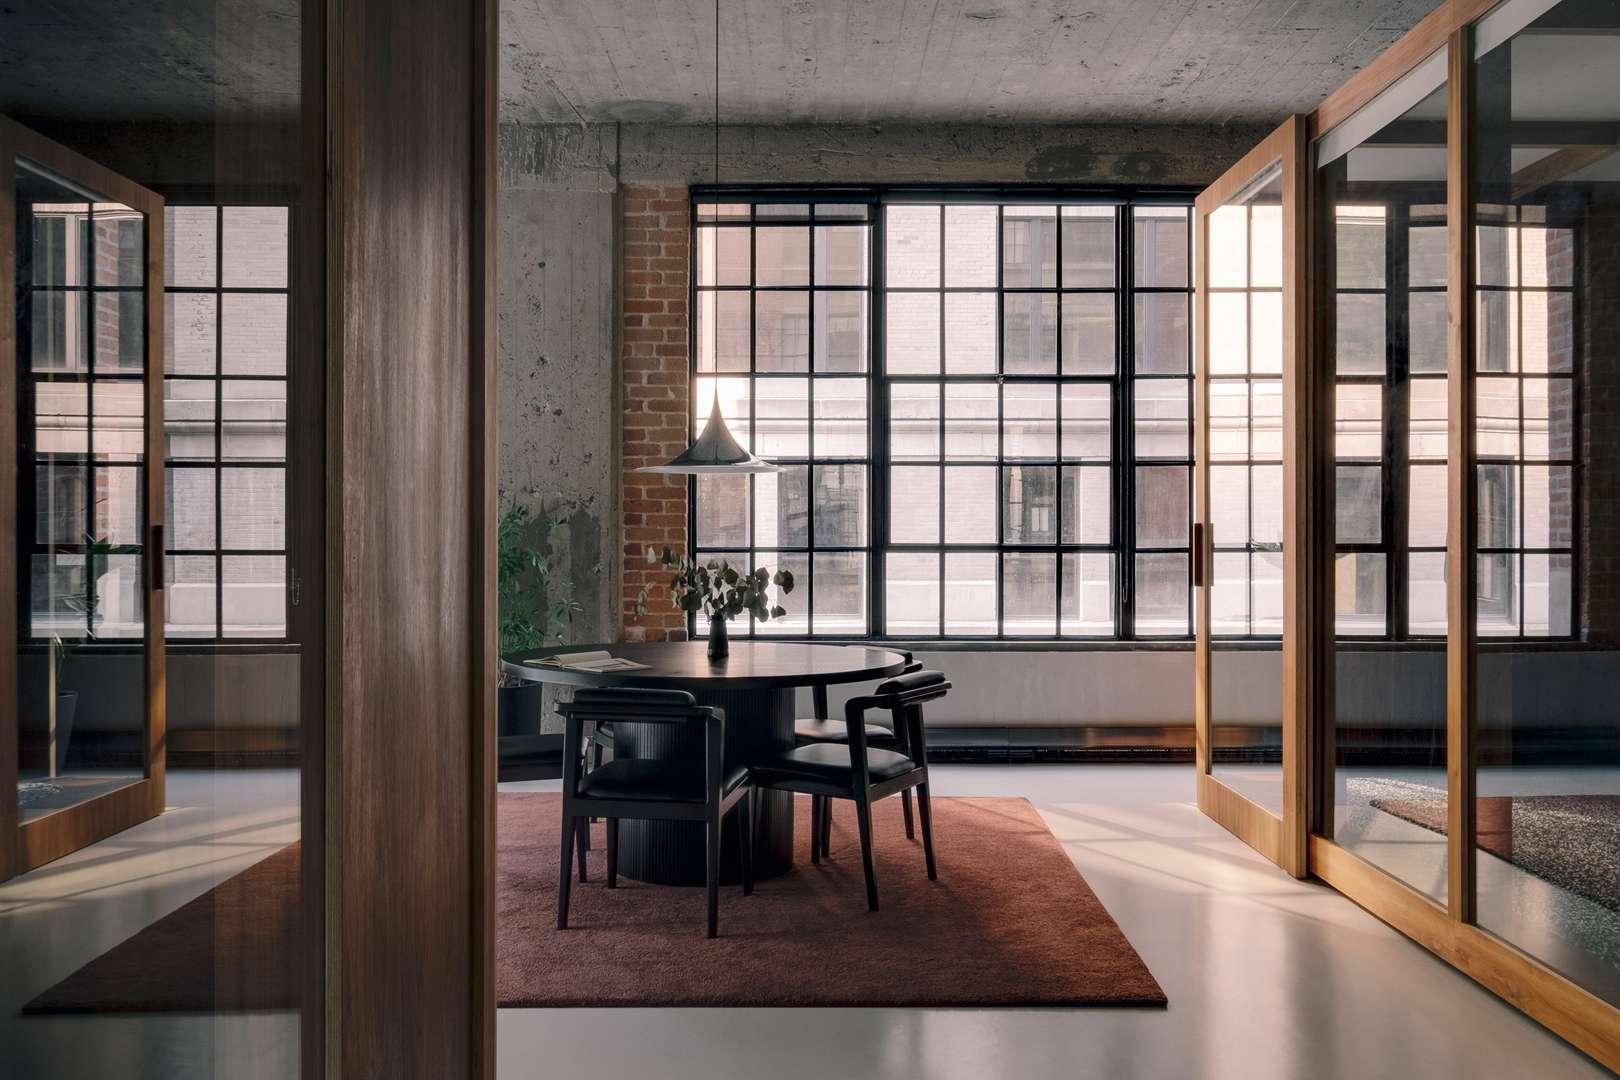 montreal-loft-renovation-by-future-simple-studio-interiors-canada_dezeen_2364_col_8